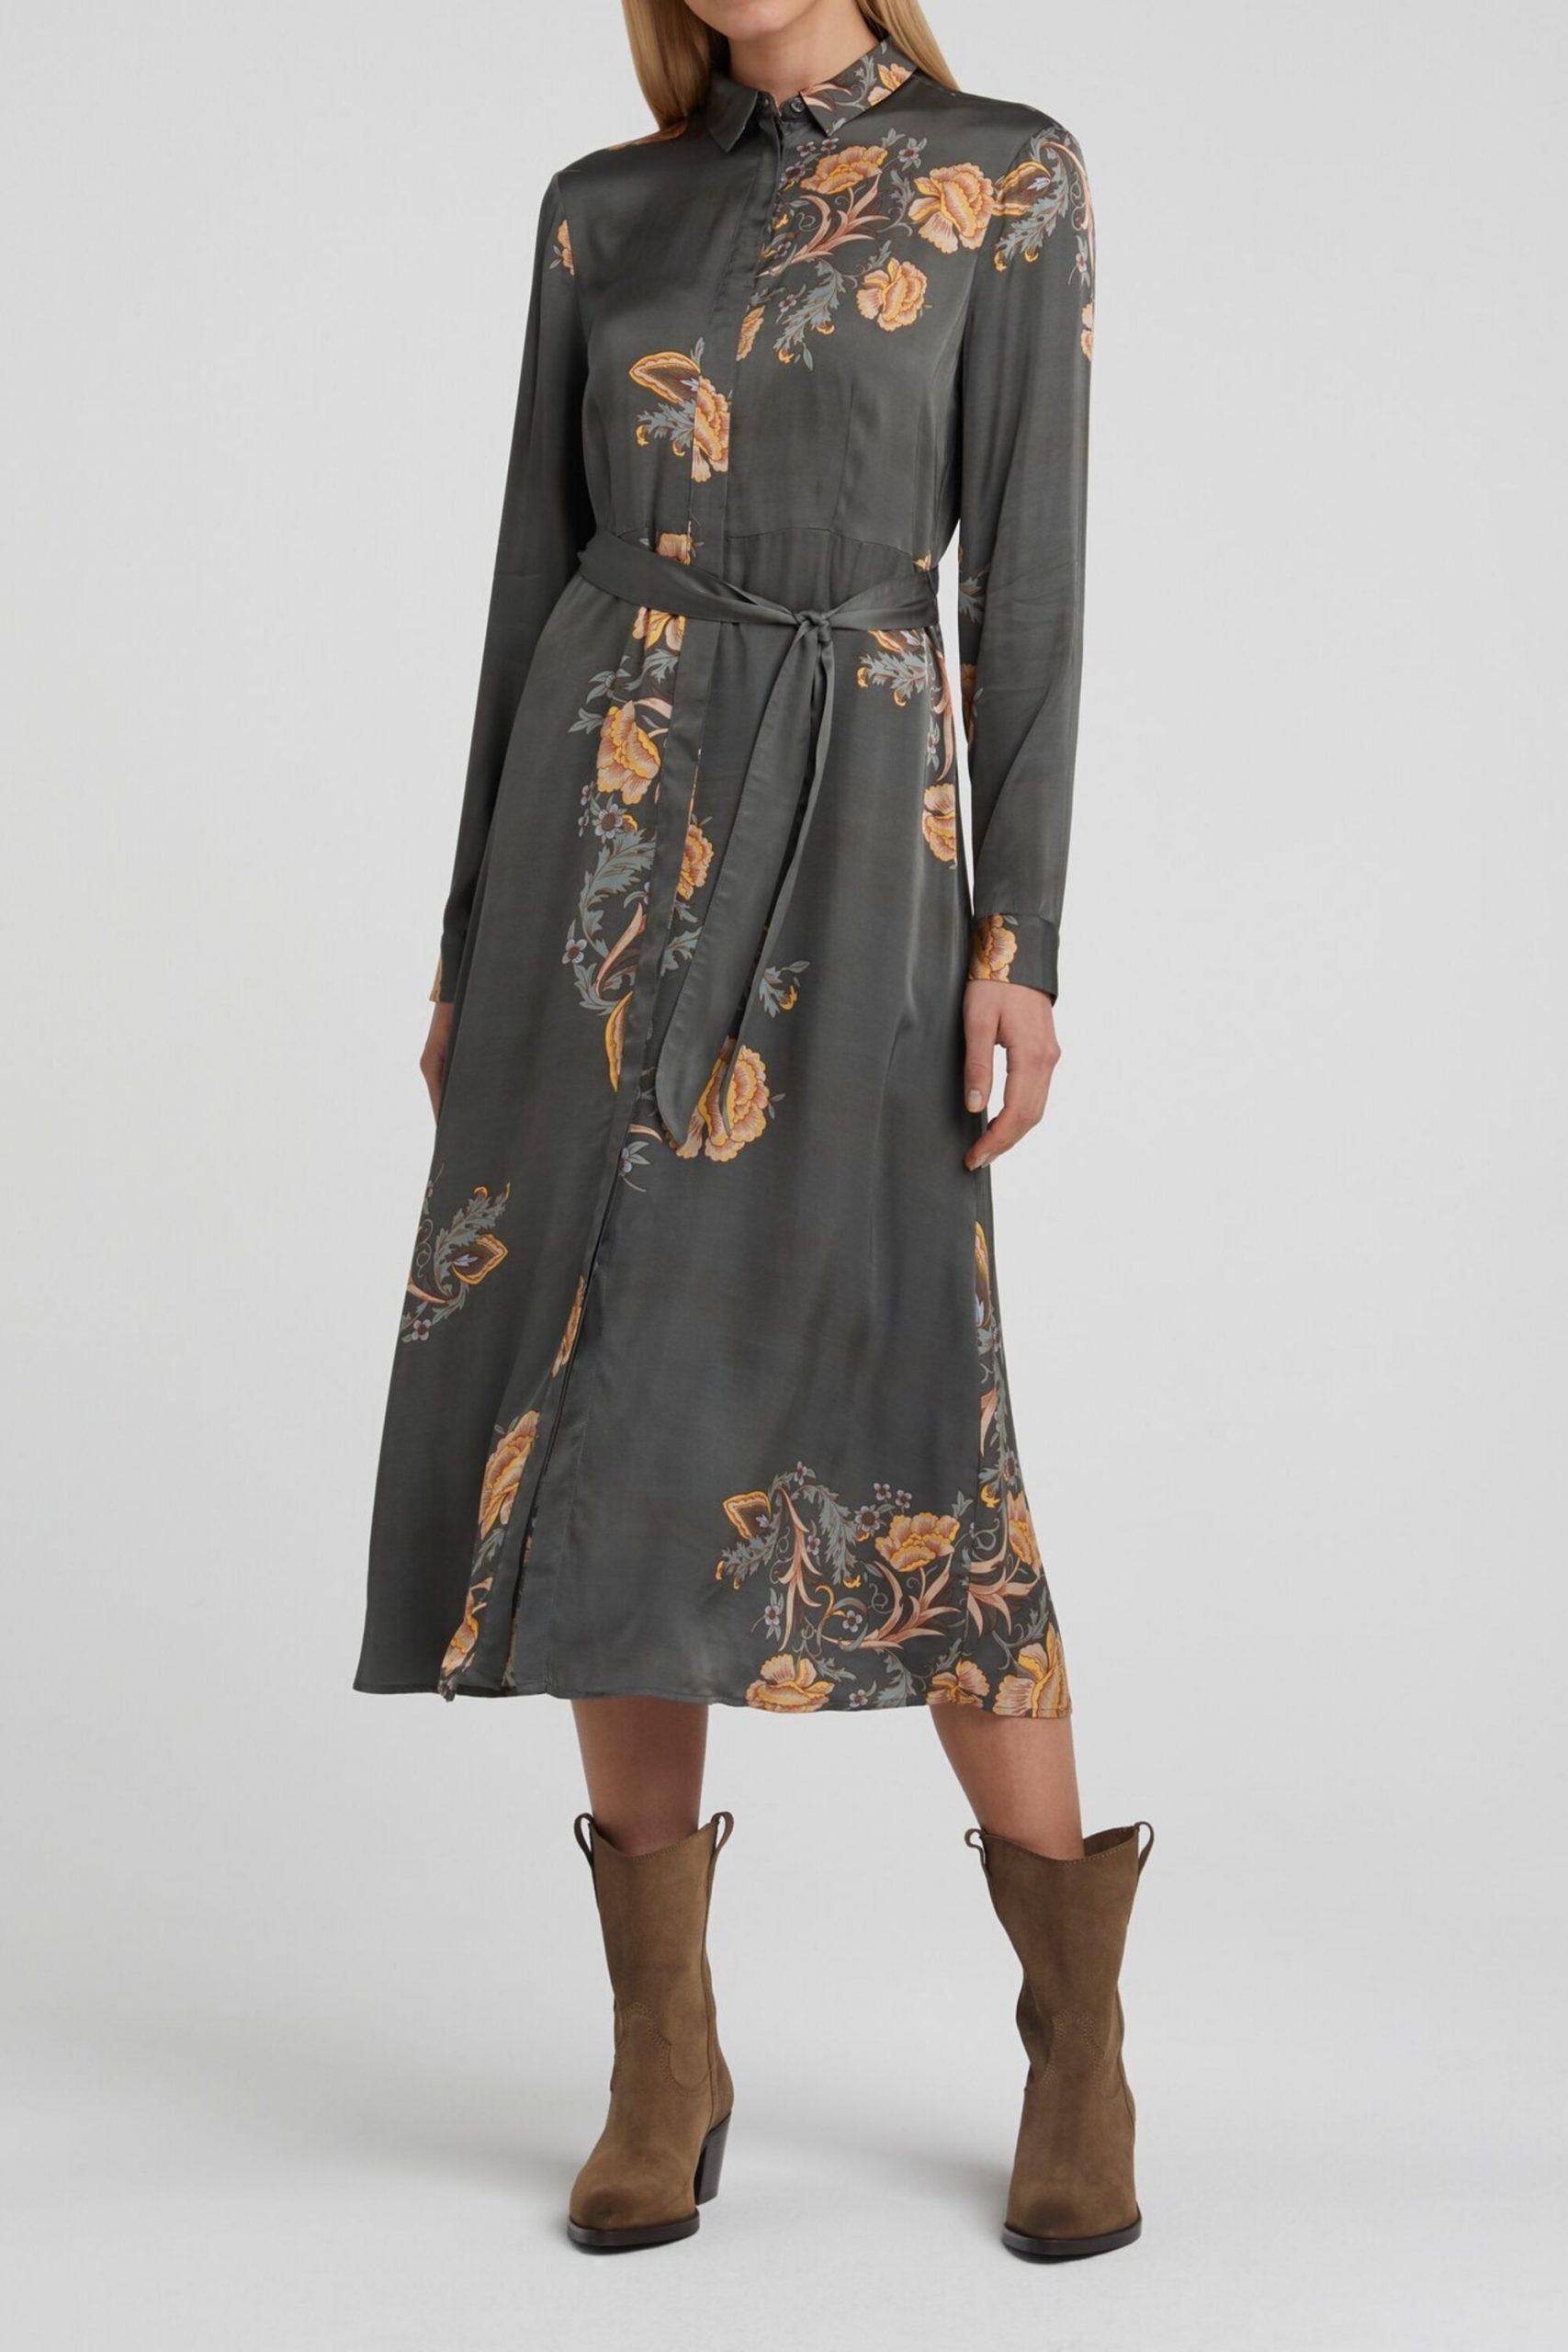 Maxi Kleid Mit Gürtel  Yaya Bei Mode Löning